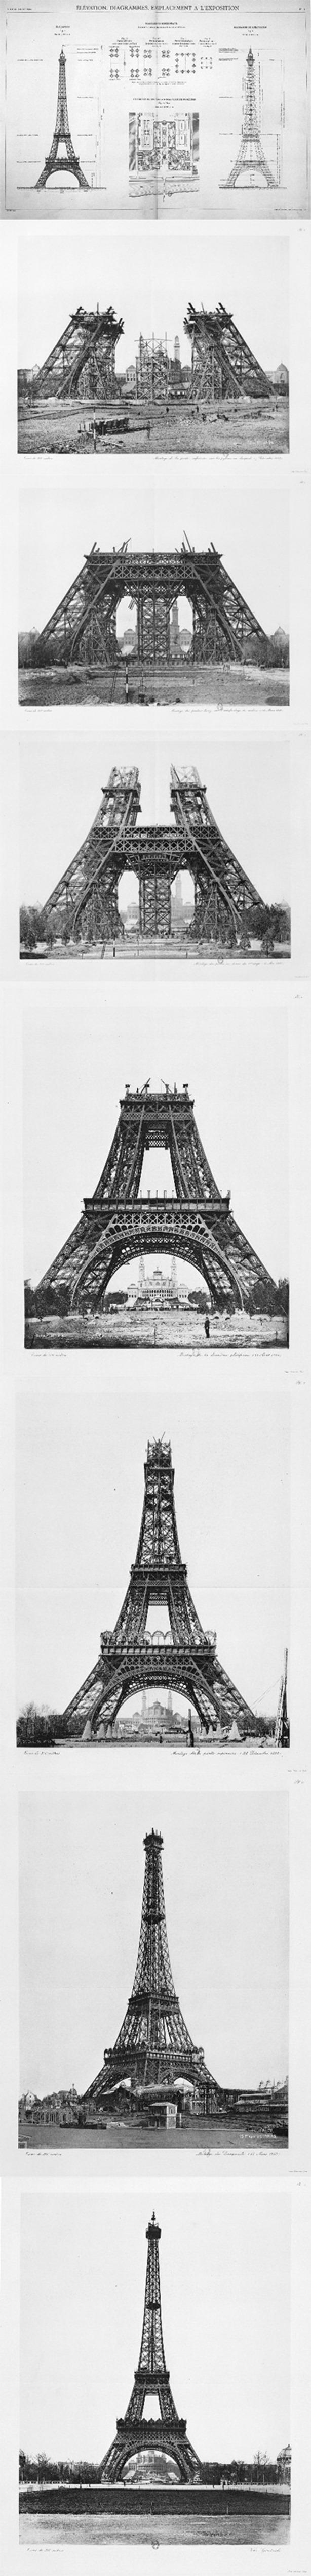 una obra de arte!   My window   Pinterest   La torre eiffel, Torres ...